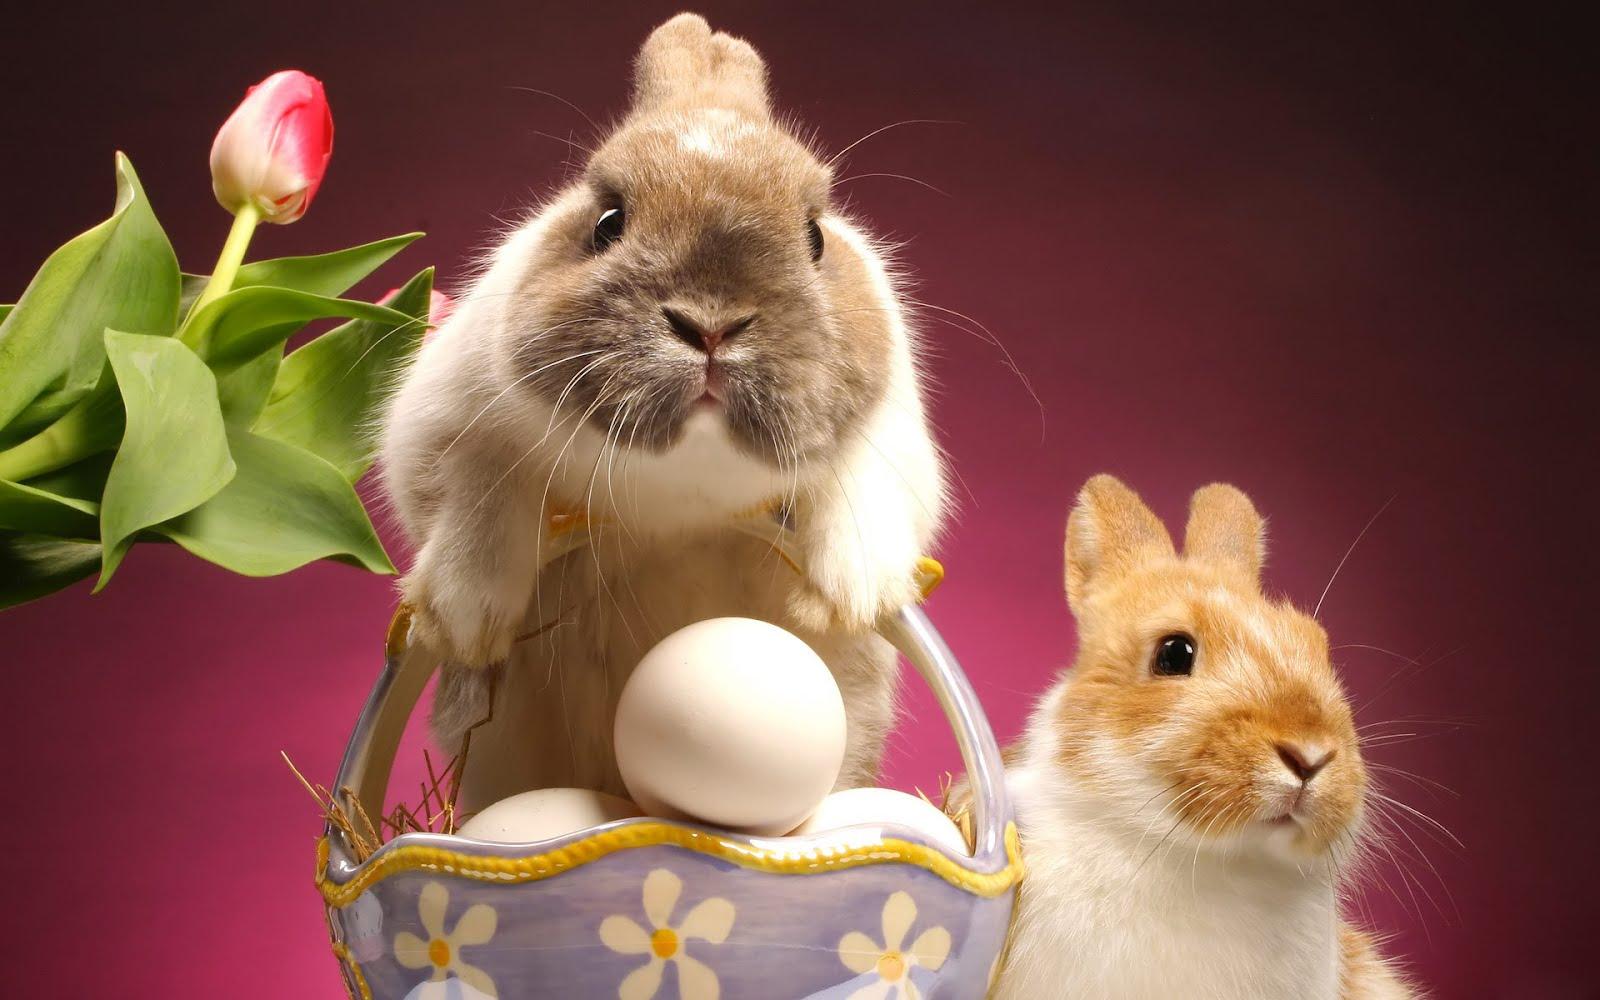 6 Cute Bunny Rabbit Easter Wallpapers for Desktop 1600x1000